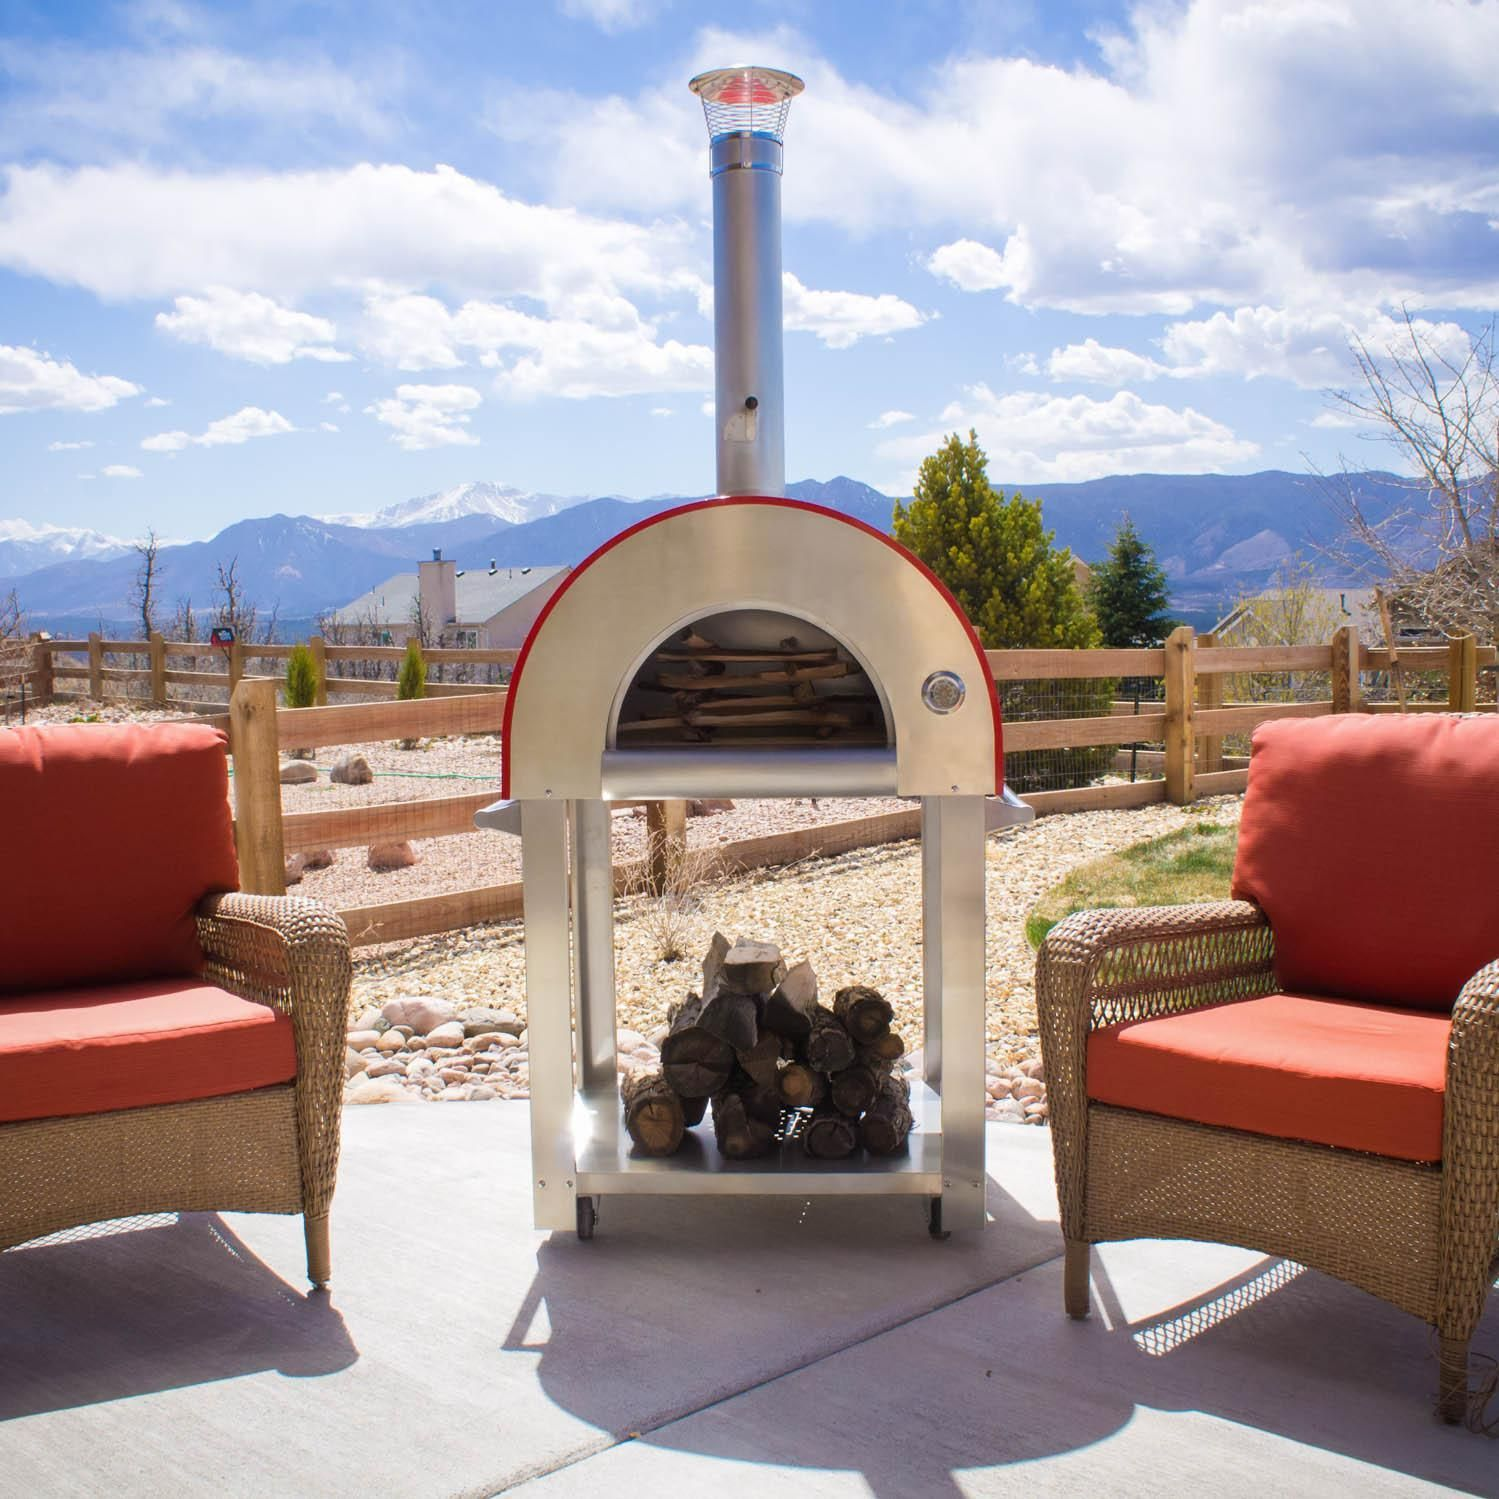 ... Bella Outdoor Living Medio C28 Pizza Oven Front Patio Church ...